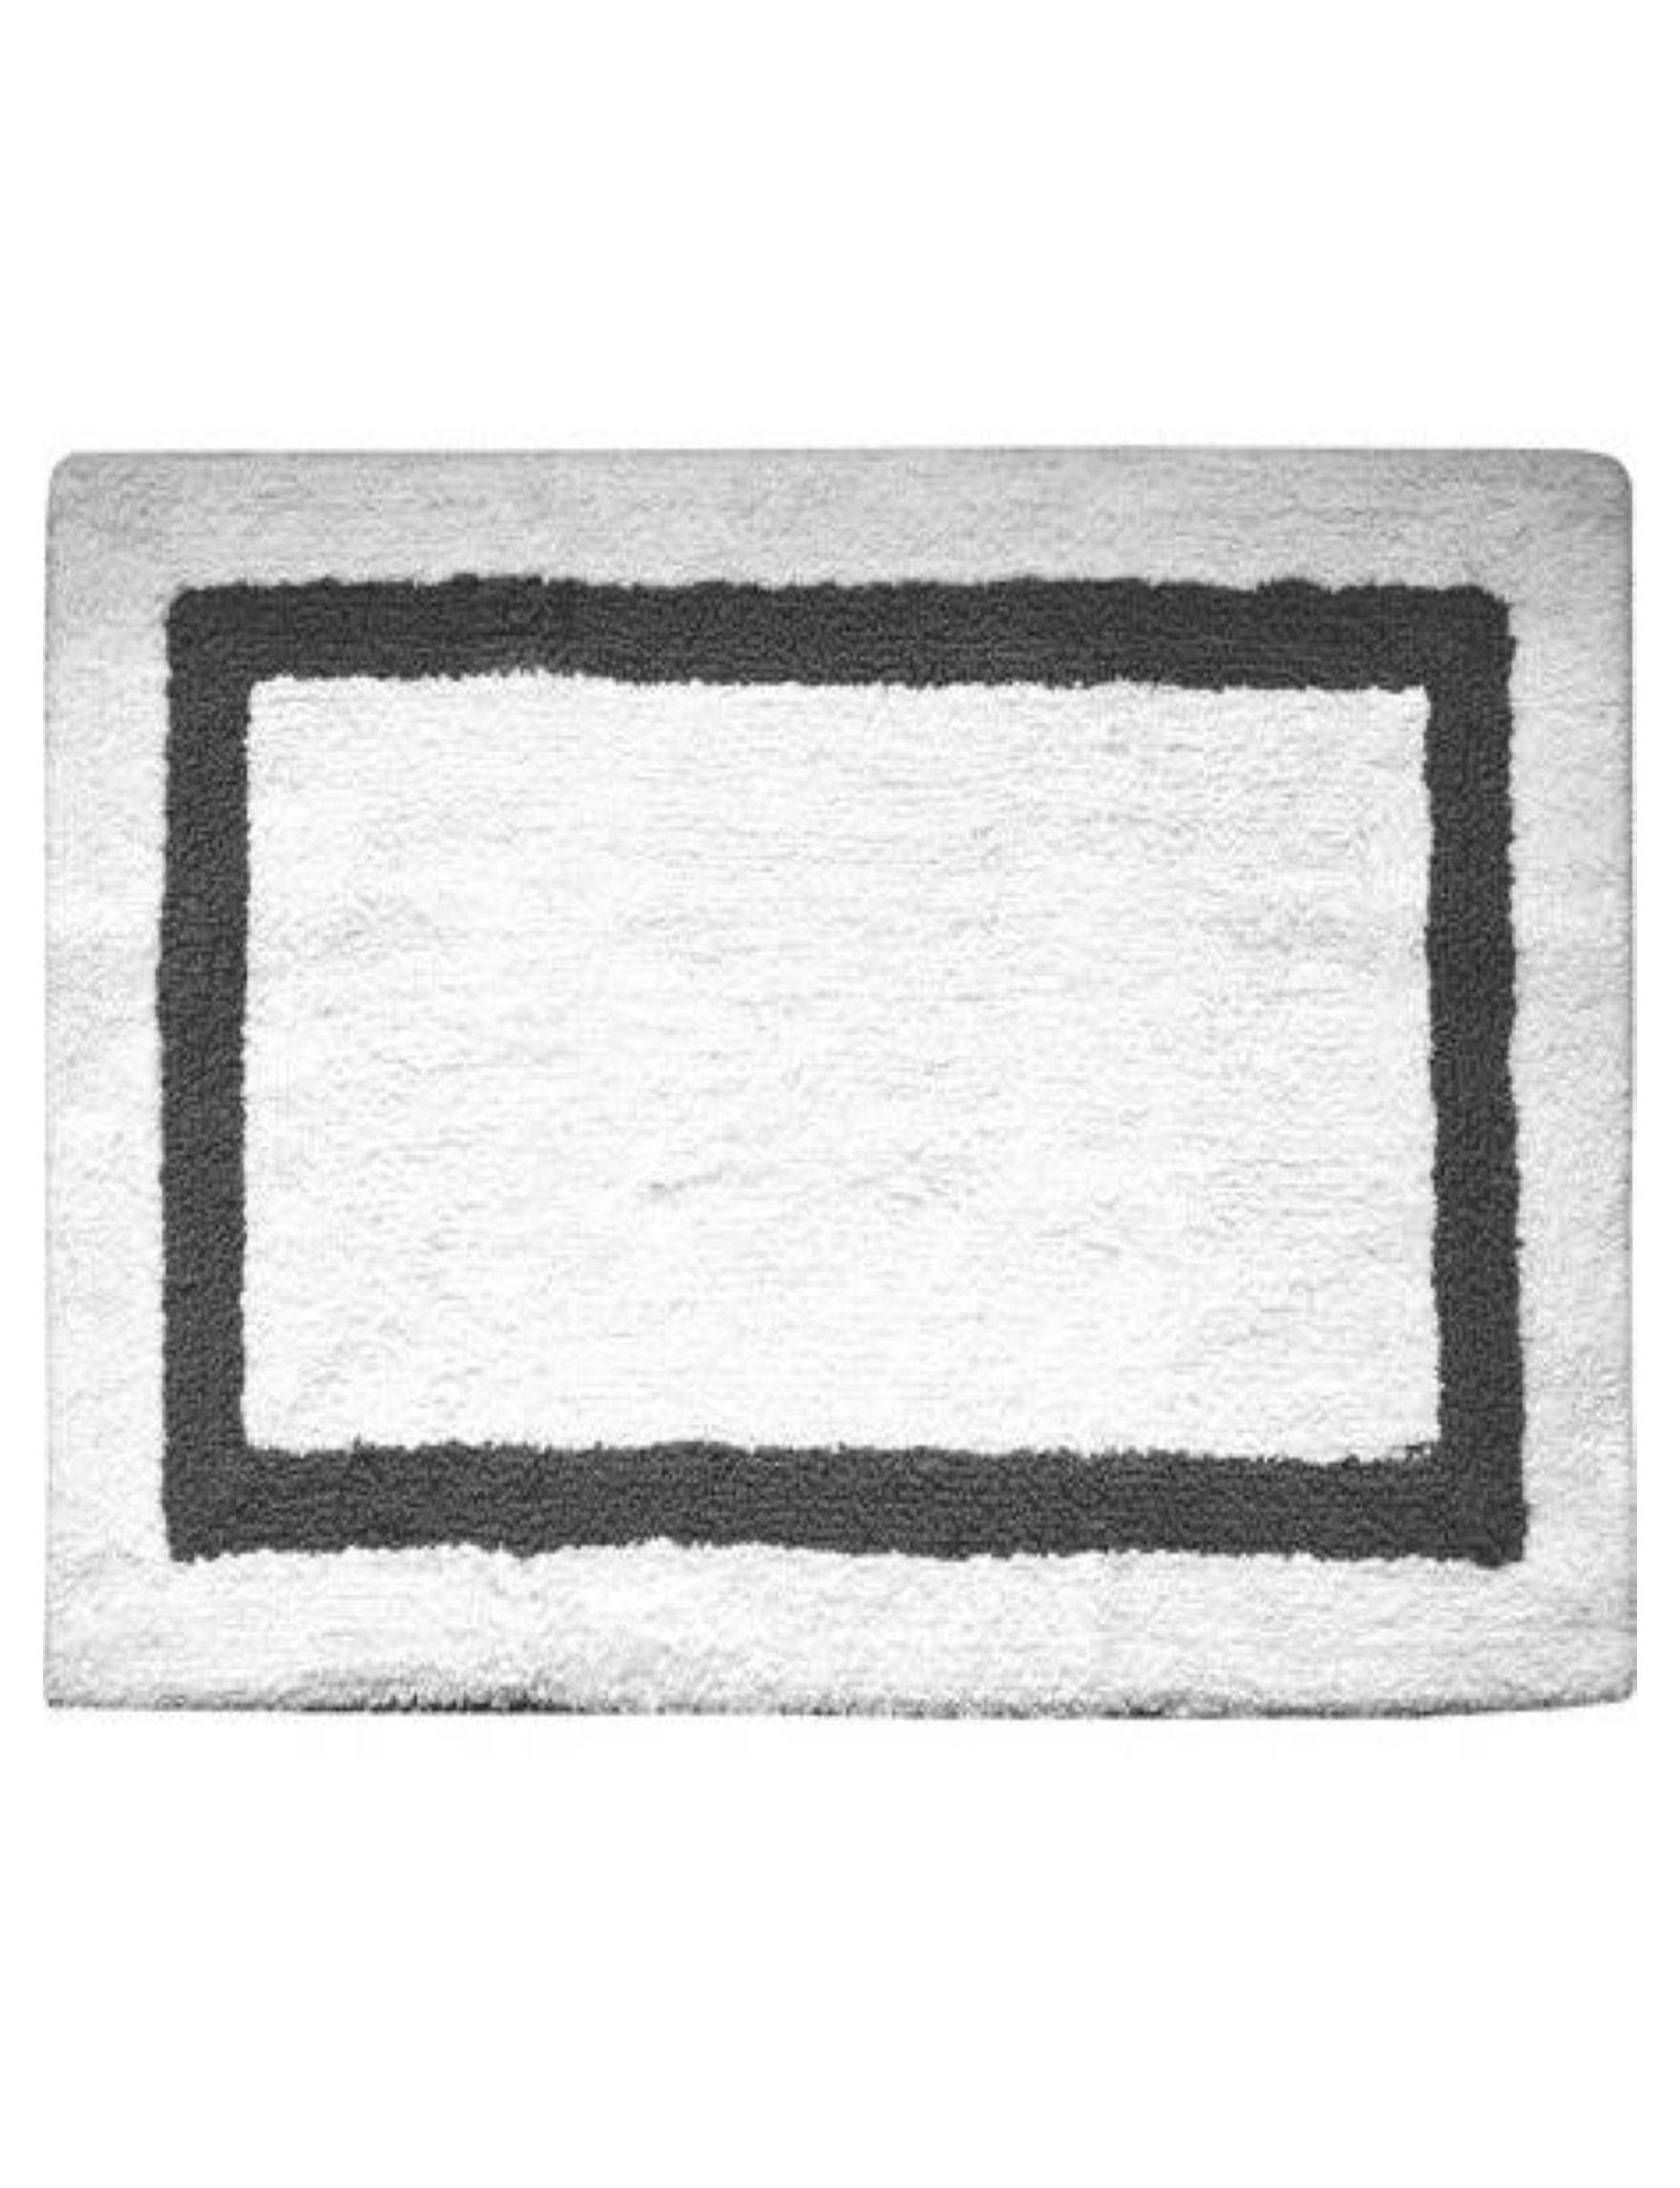 Idea Nuova Grey / Black Bath Rugs & Mats